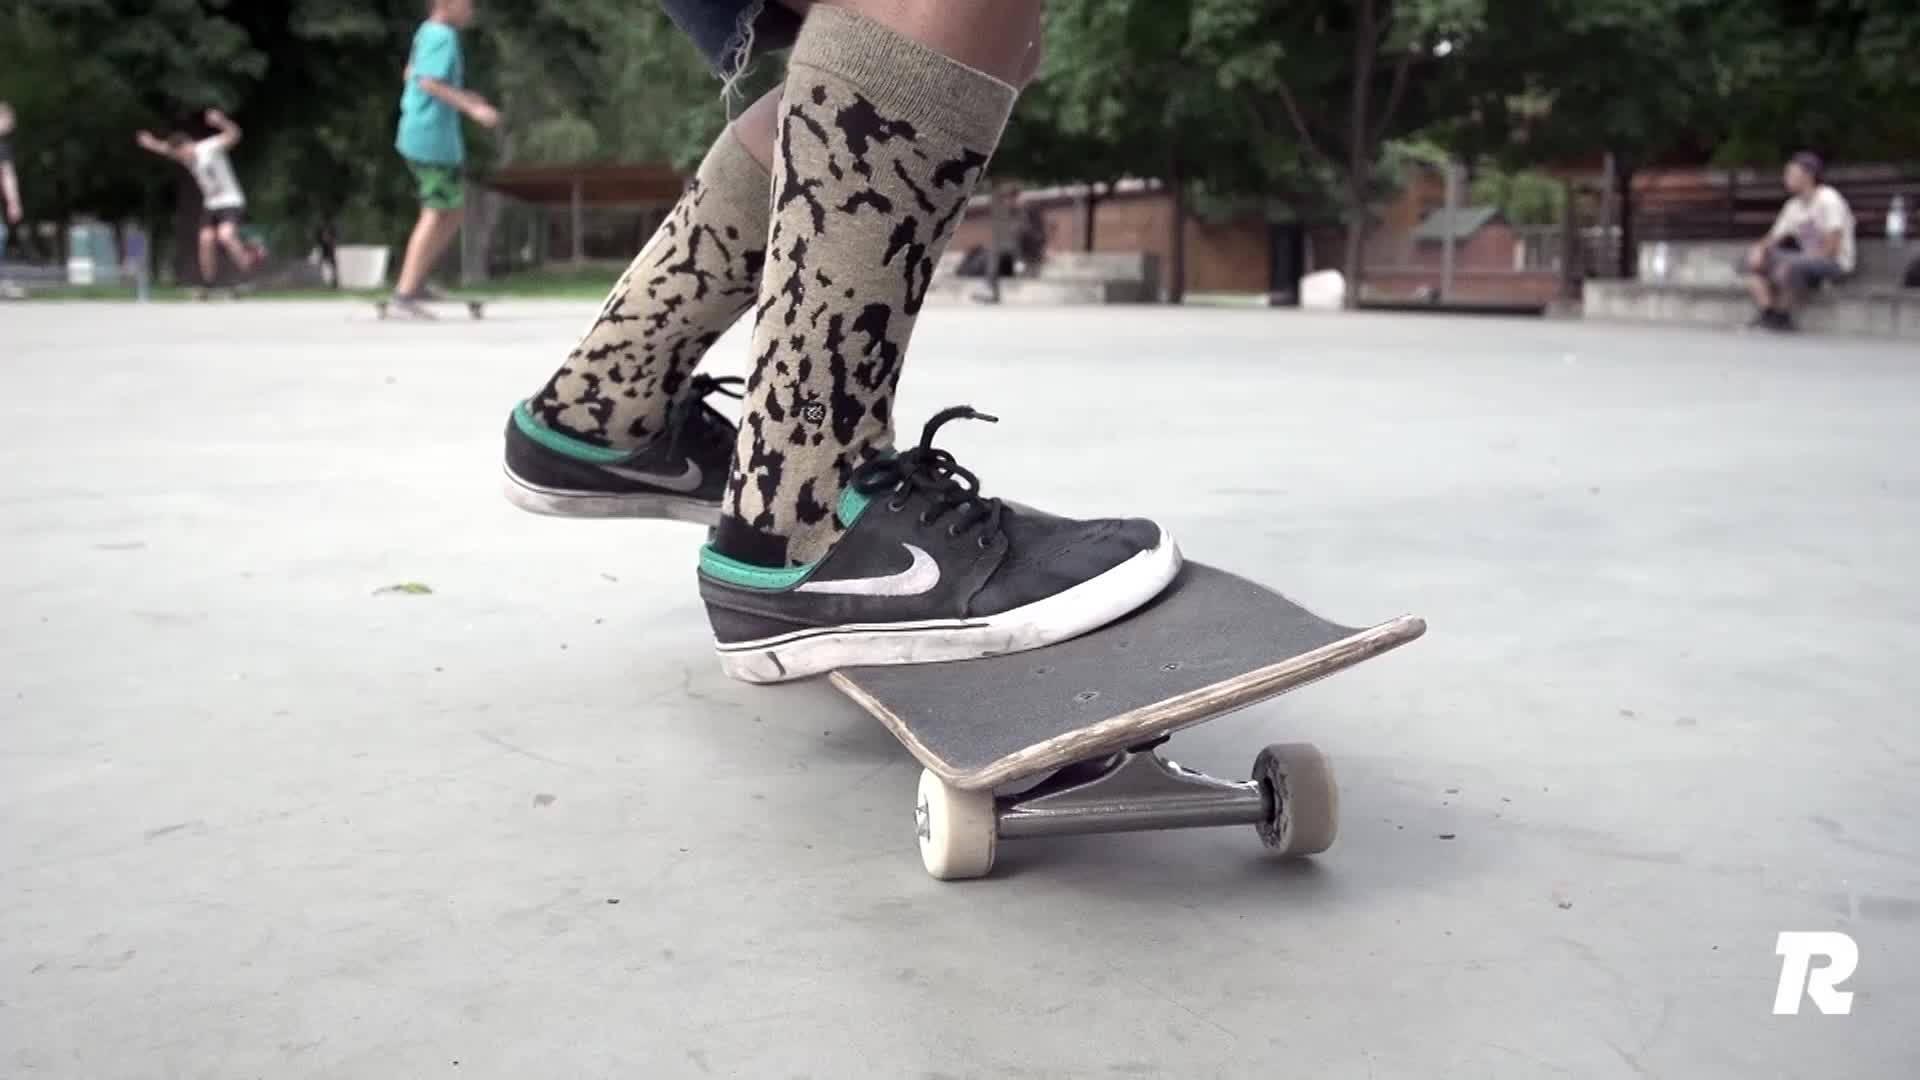 Skateboarding photo